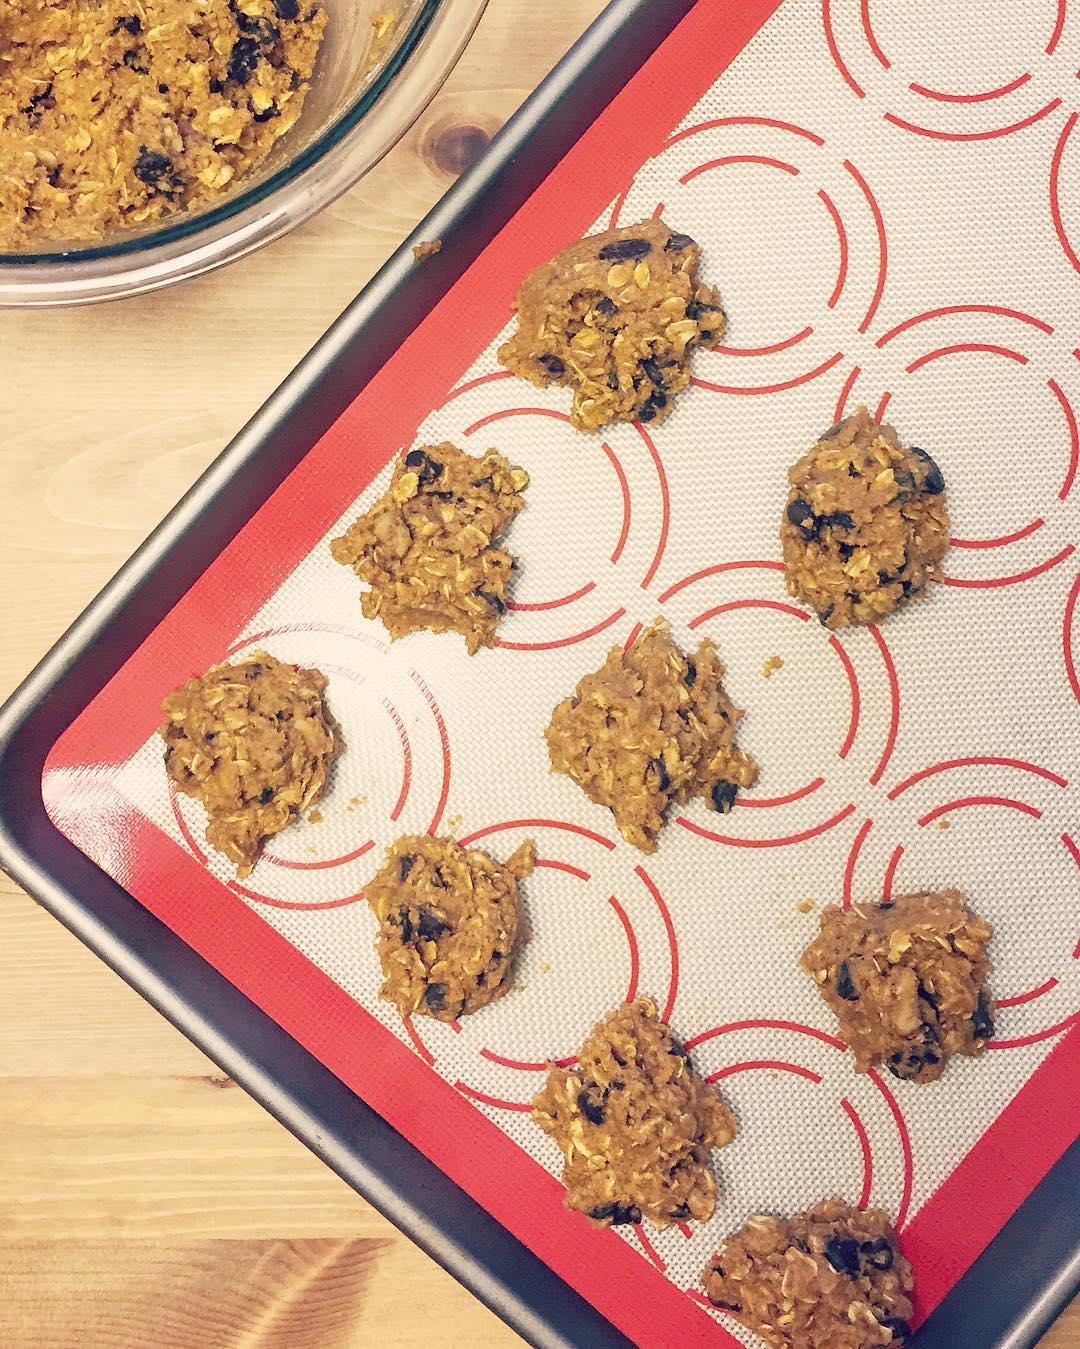 pumpkin pie chocolate chip oatmeal cookies by @maggiemetcrossfit